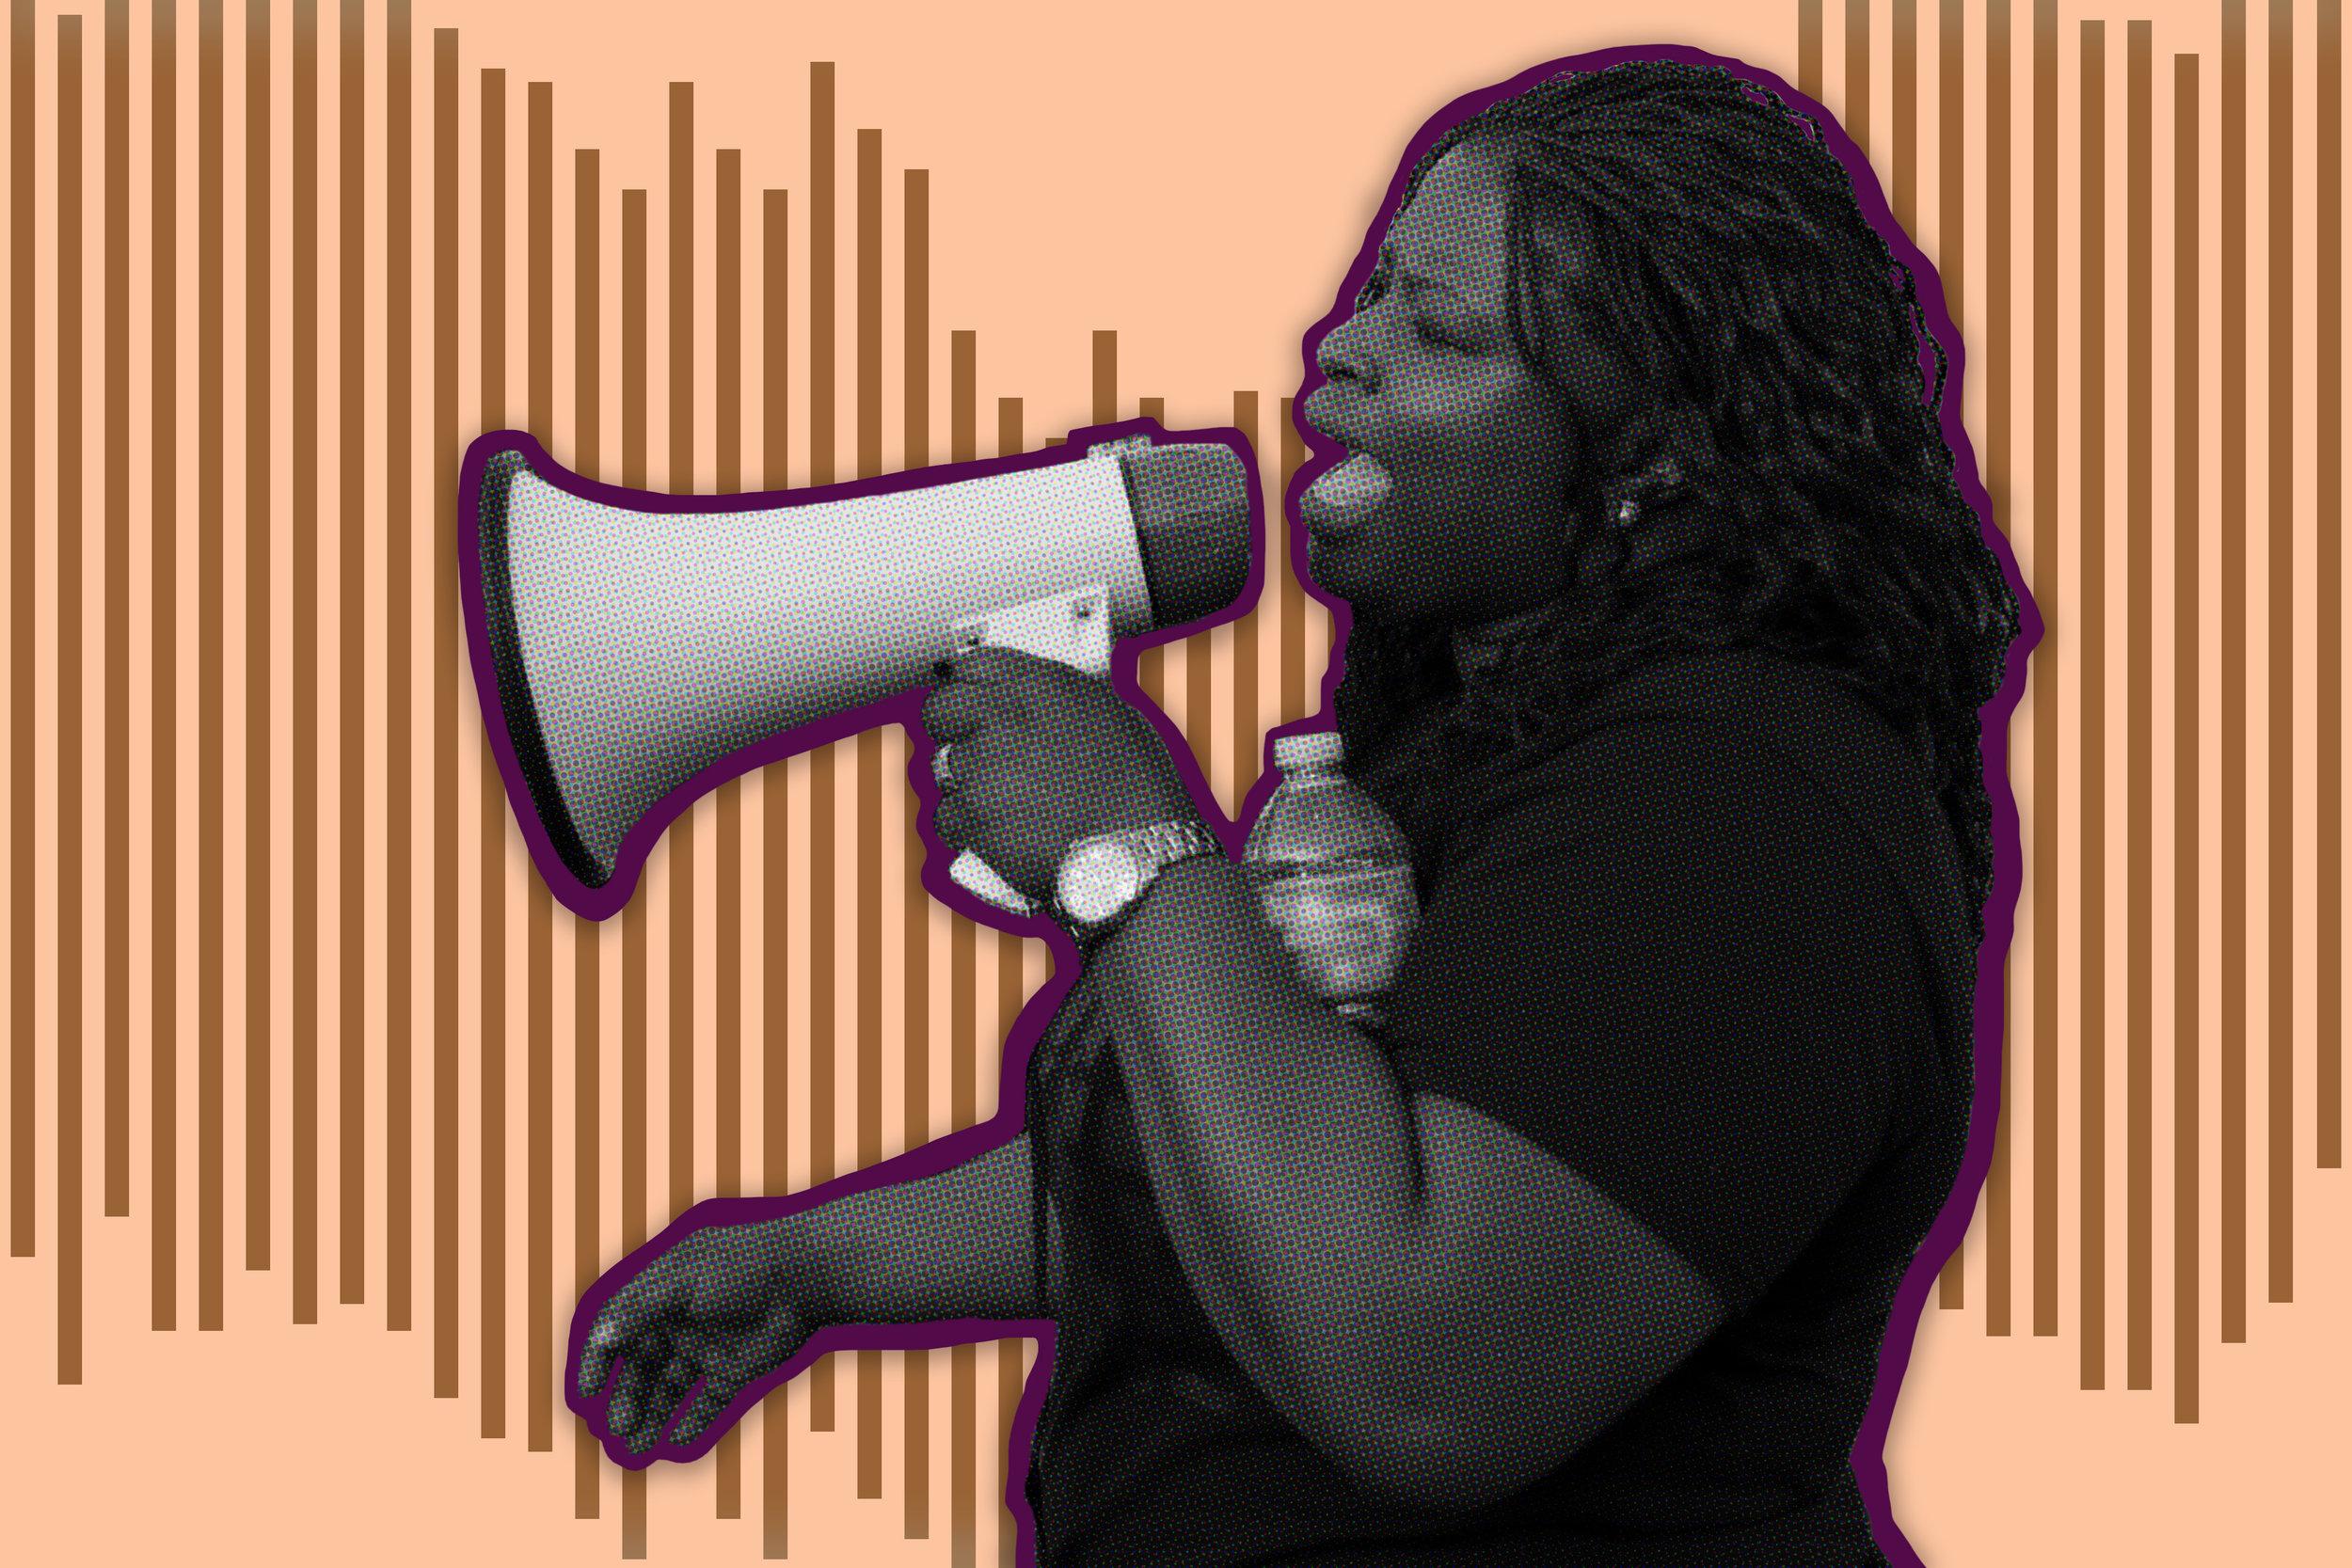 Angry Black Woman_03.jpg